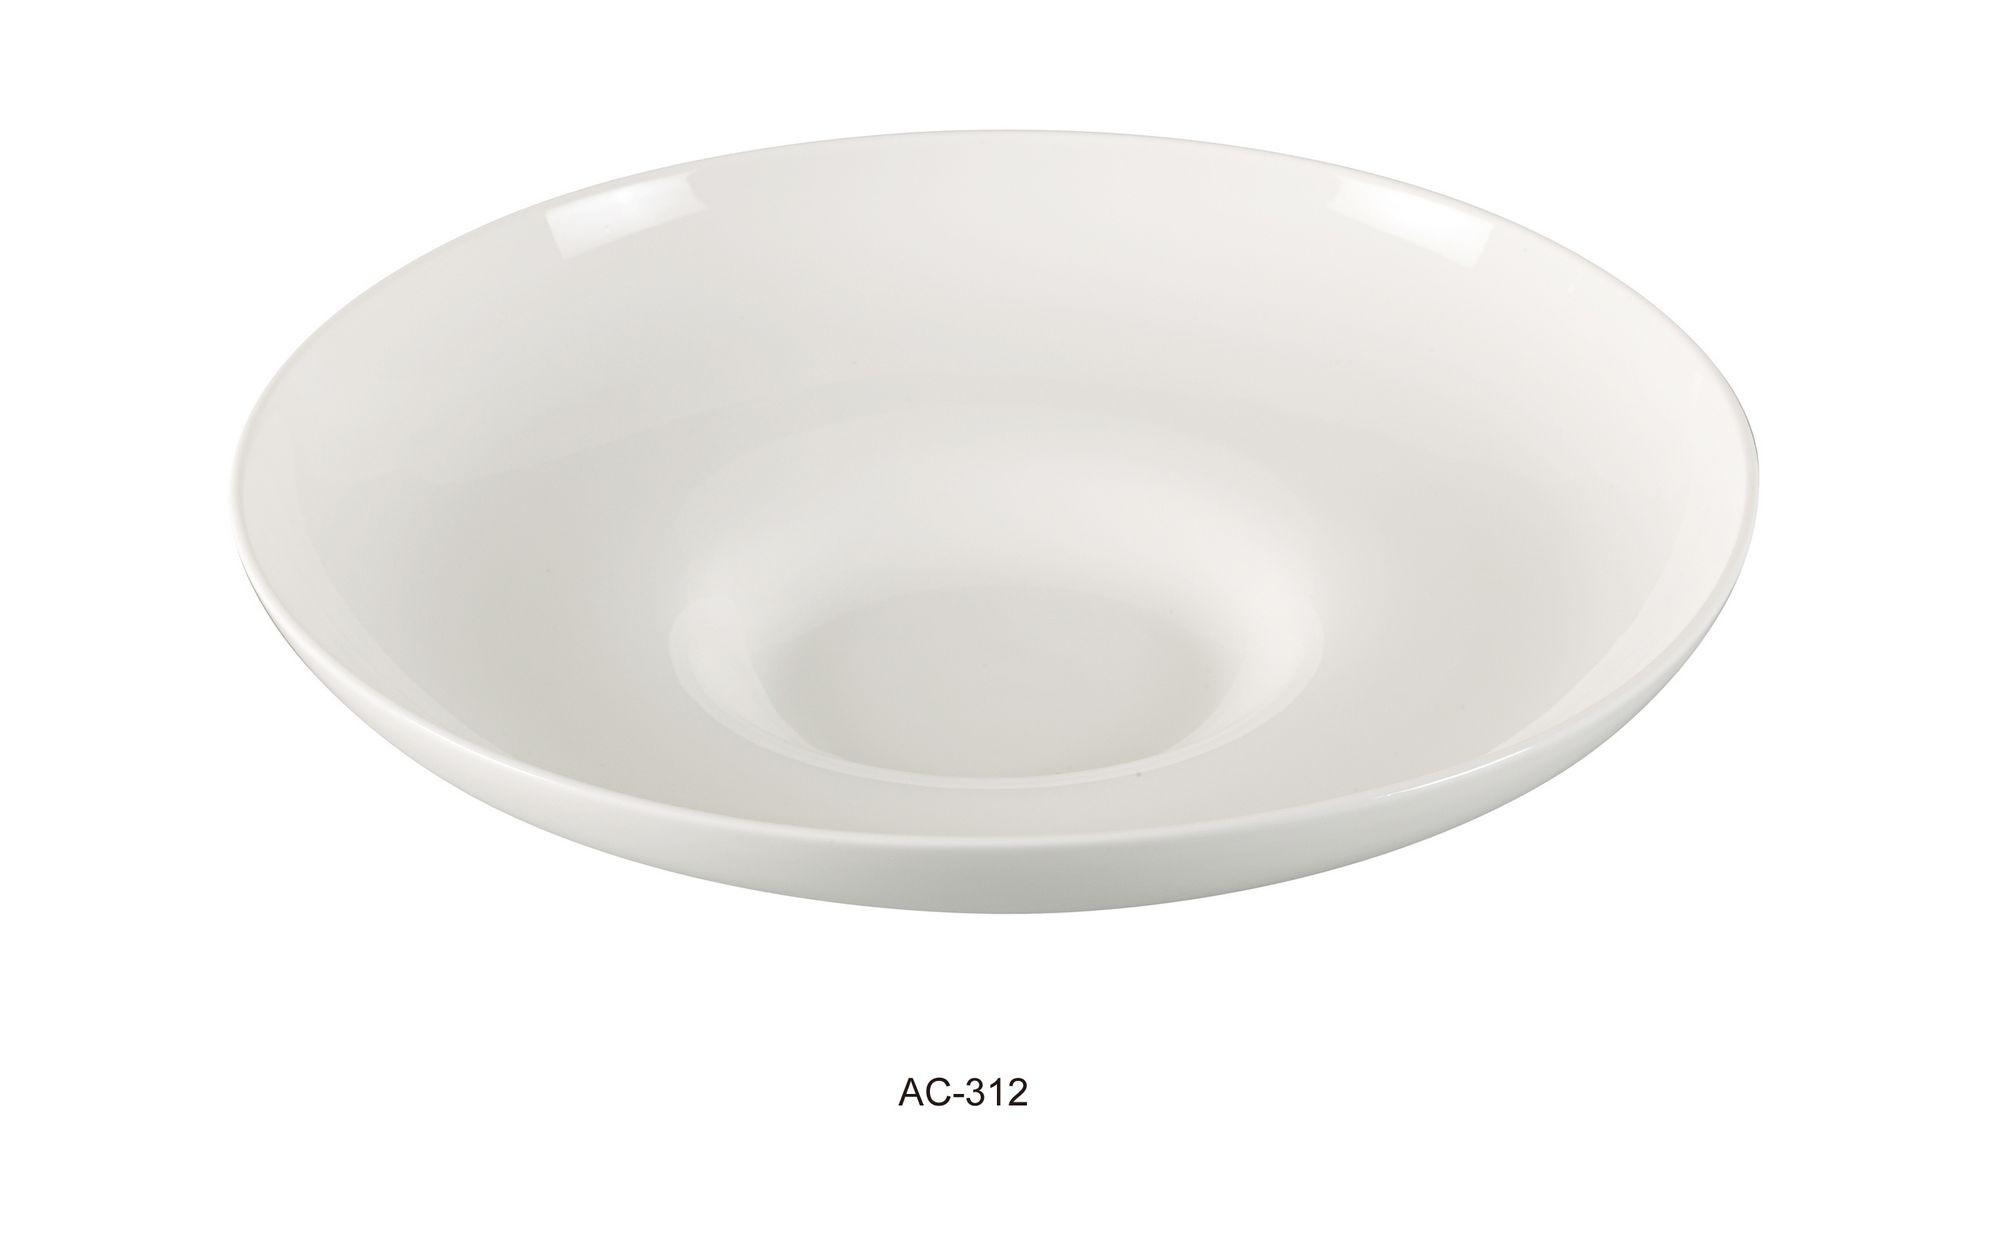 "Yanco AC-312 Abco 12"" x 2 1/2"" Mediterranean Pasta Bowl 22 oz."